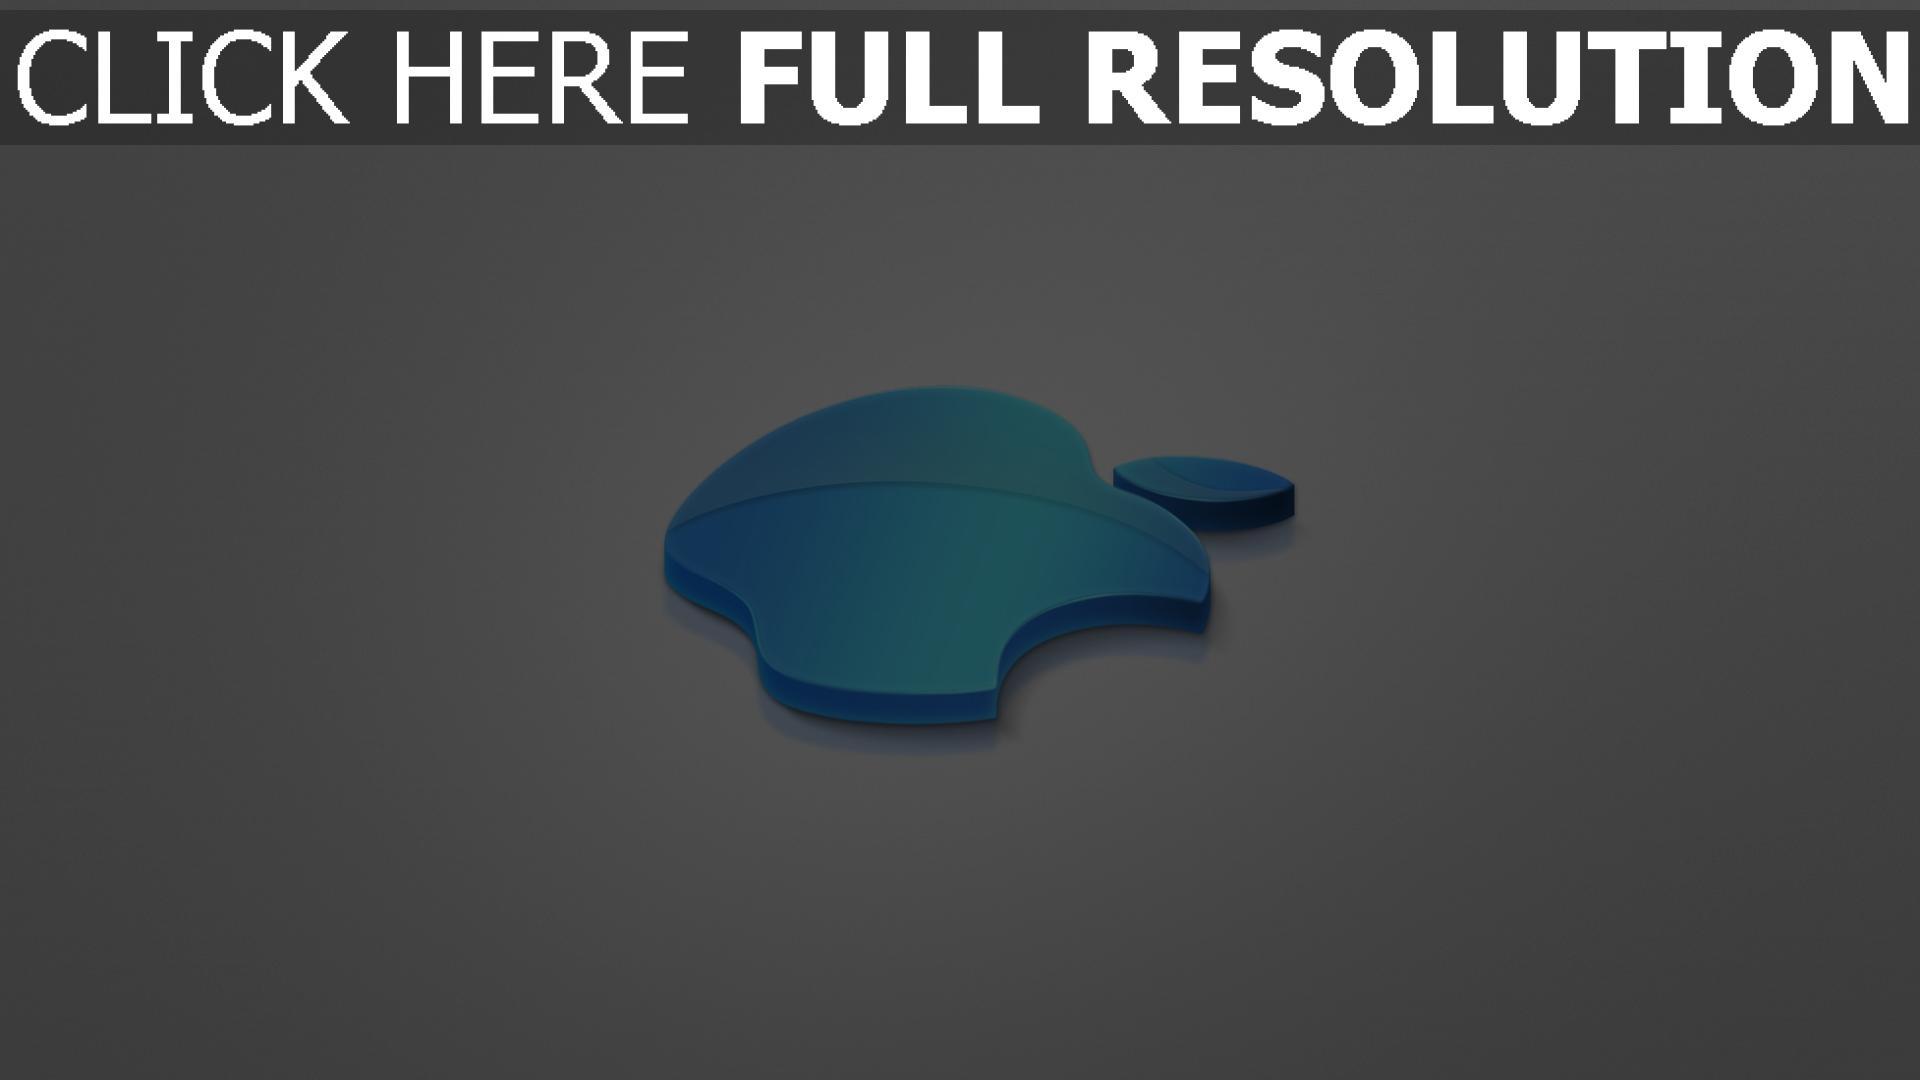 hd hintergrundbilder apple logo blau volumen grau emblem 1920x1080